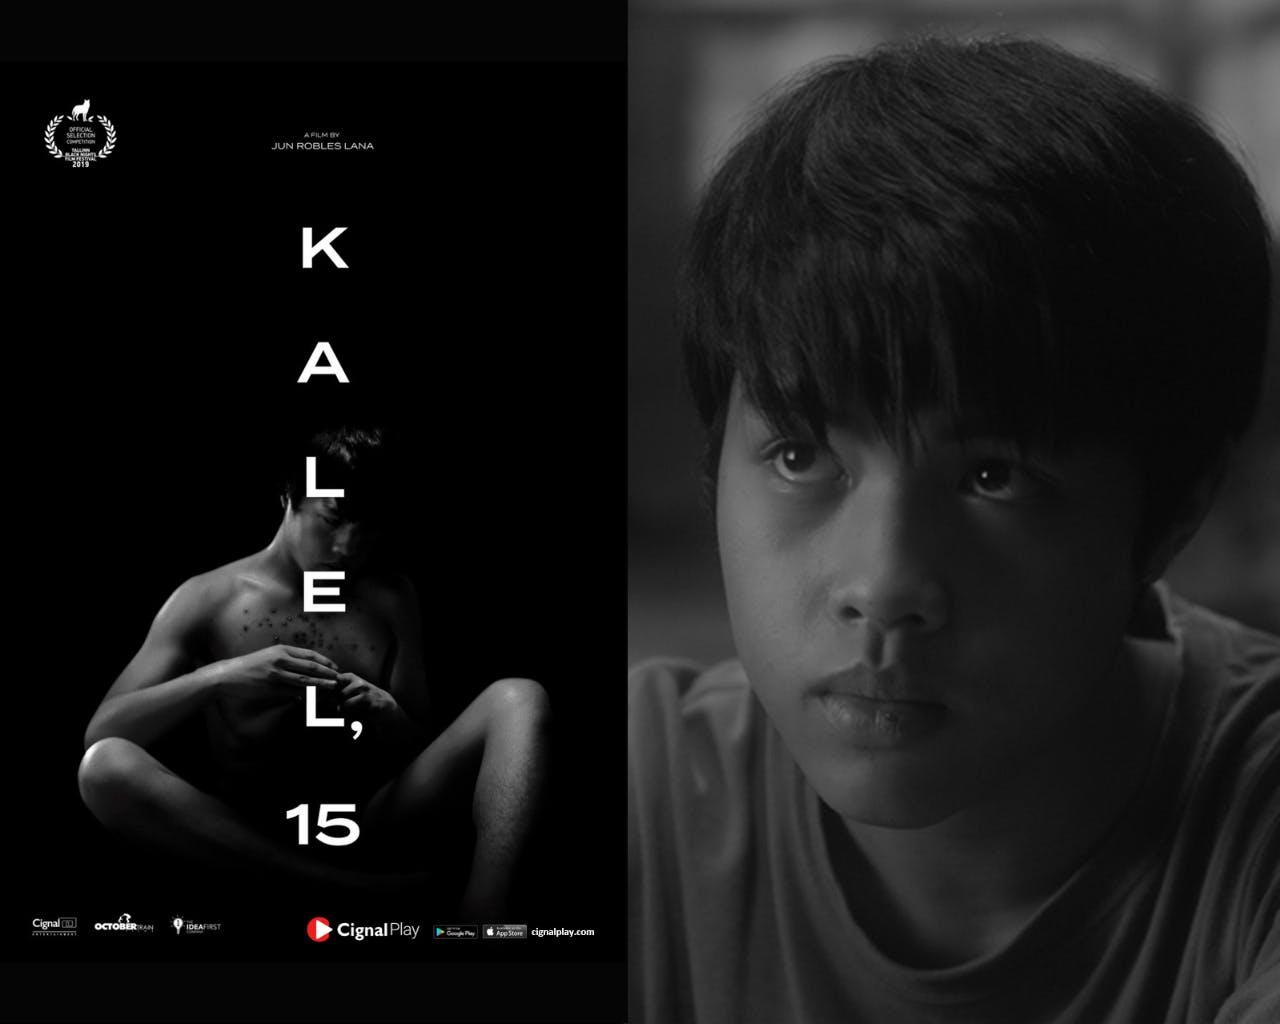 Kalel, 15 Now On Cignal Play